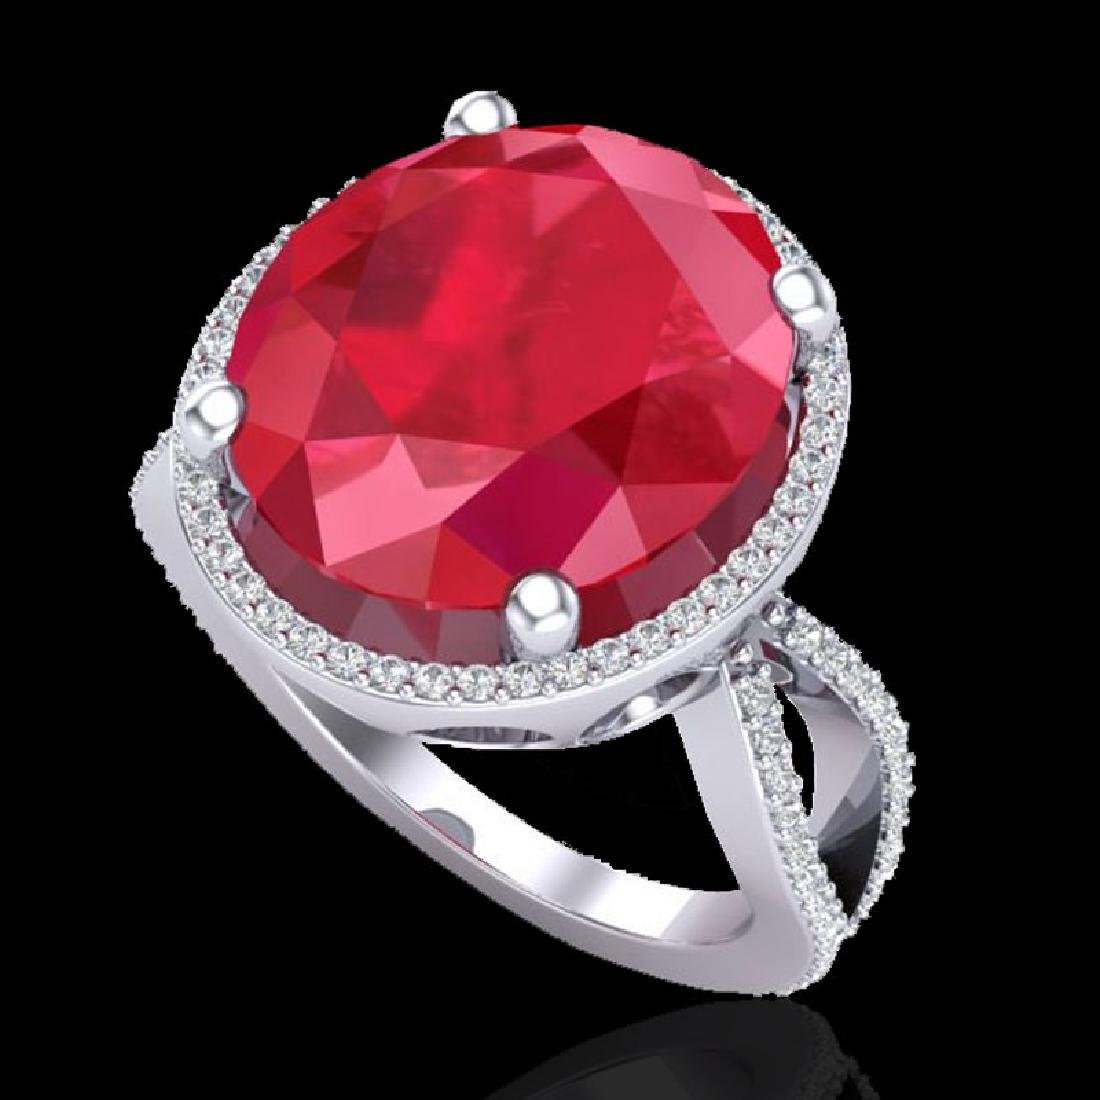 12 CTW Ruby & Micro Pave VS/SI Diamond Halo Ring 18K - 2